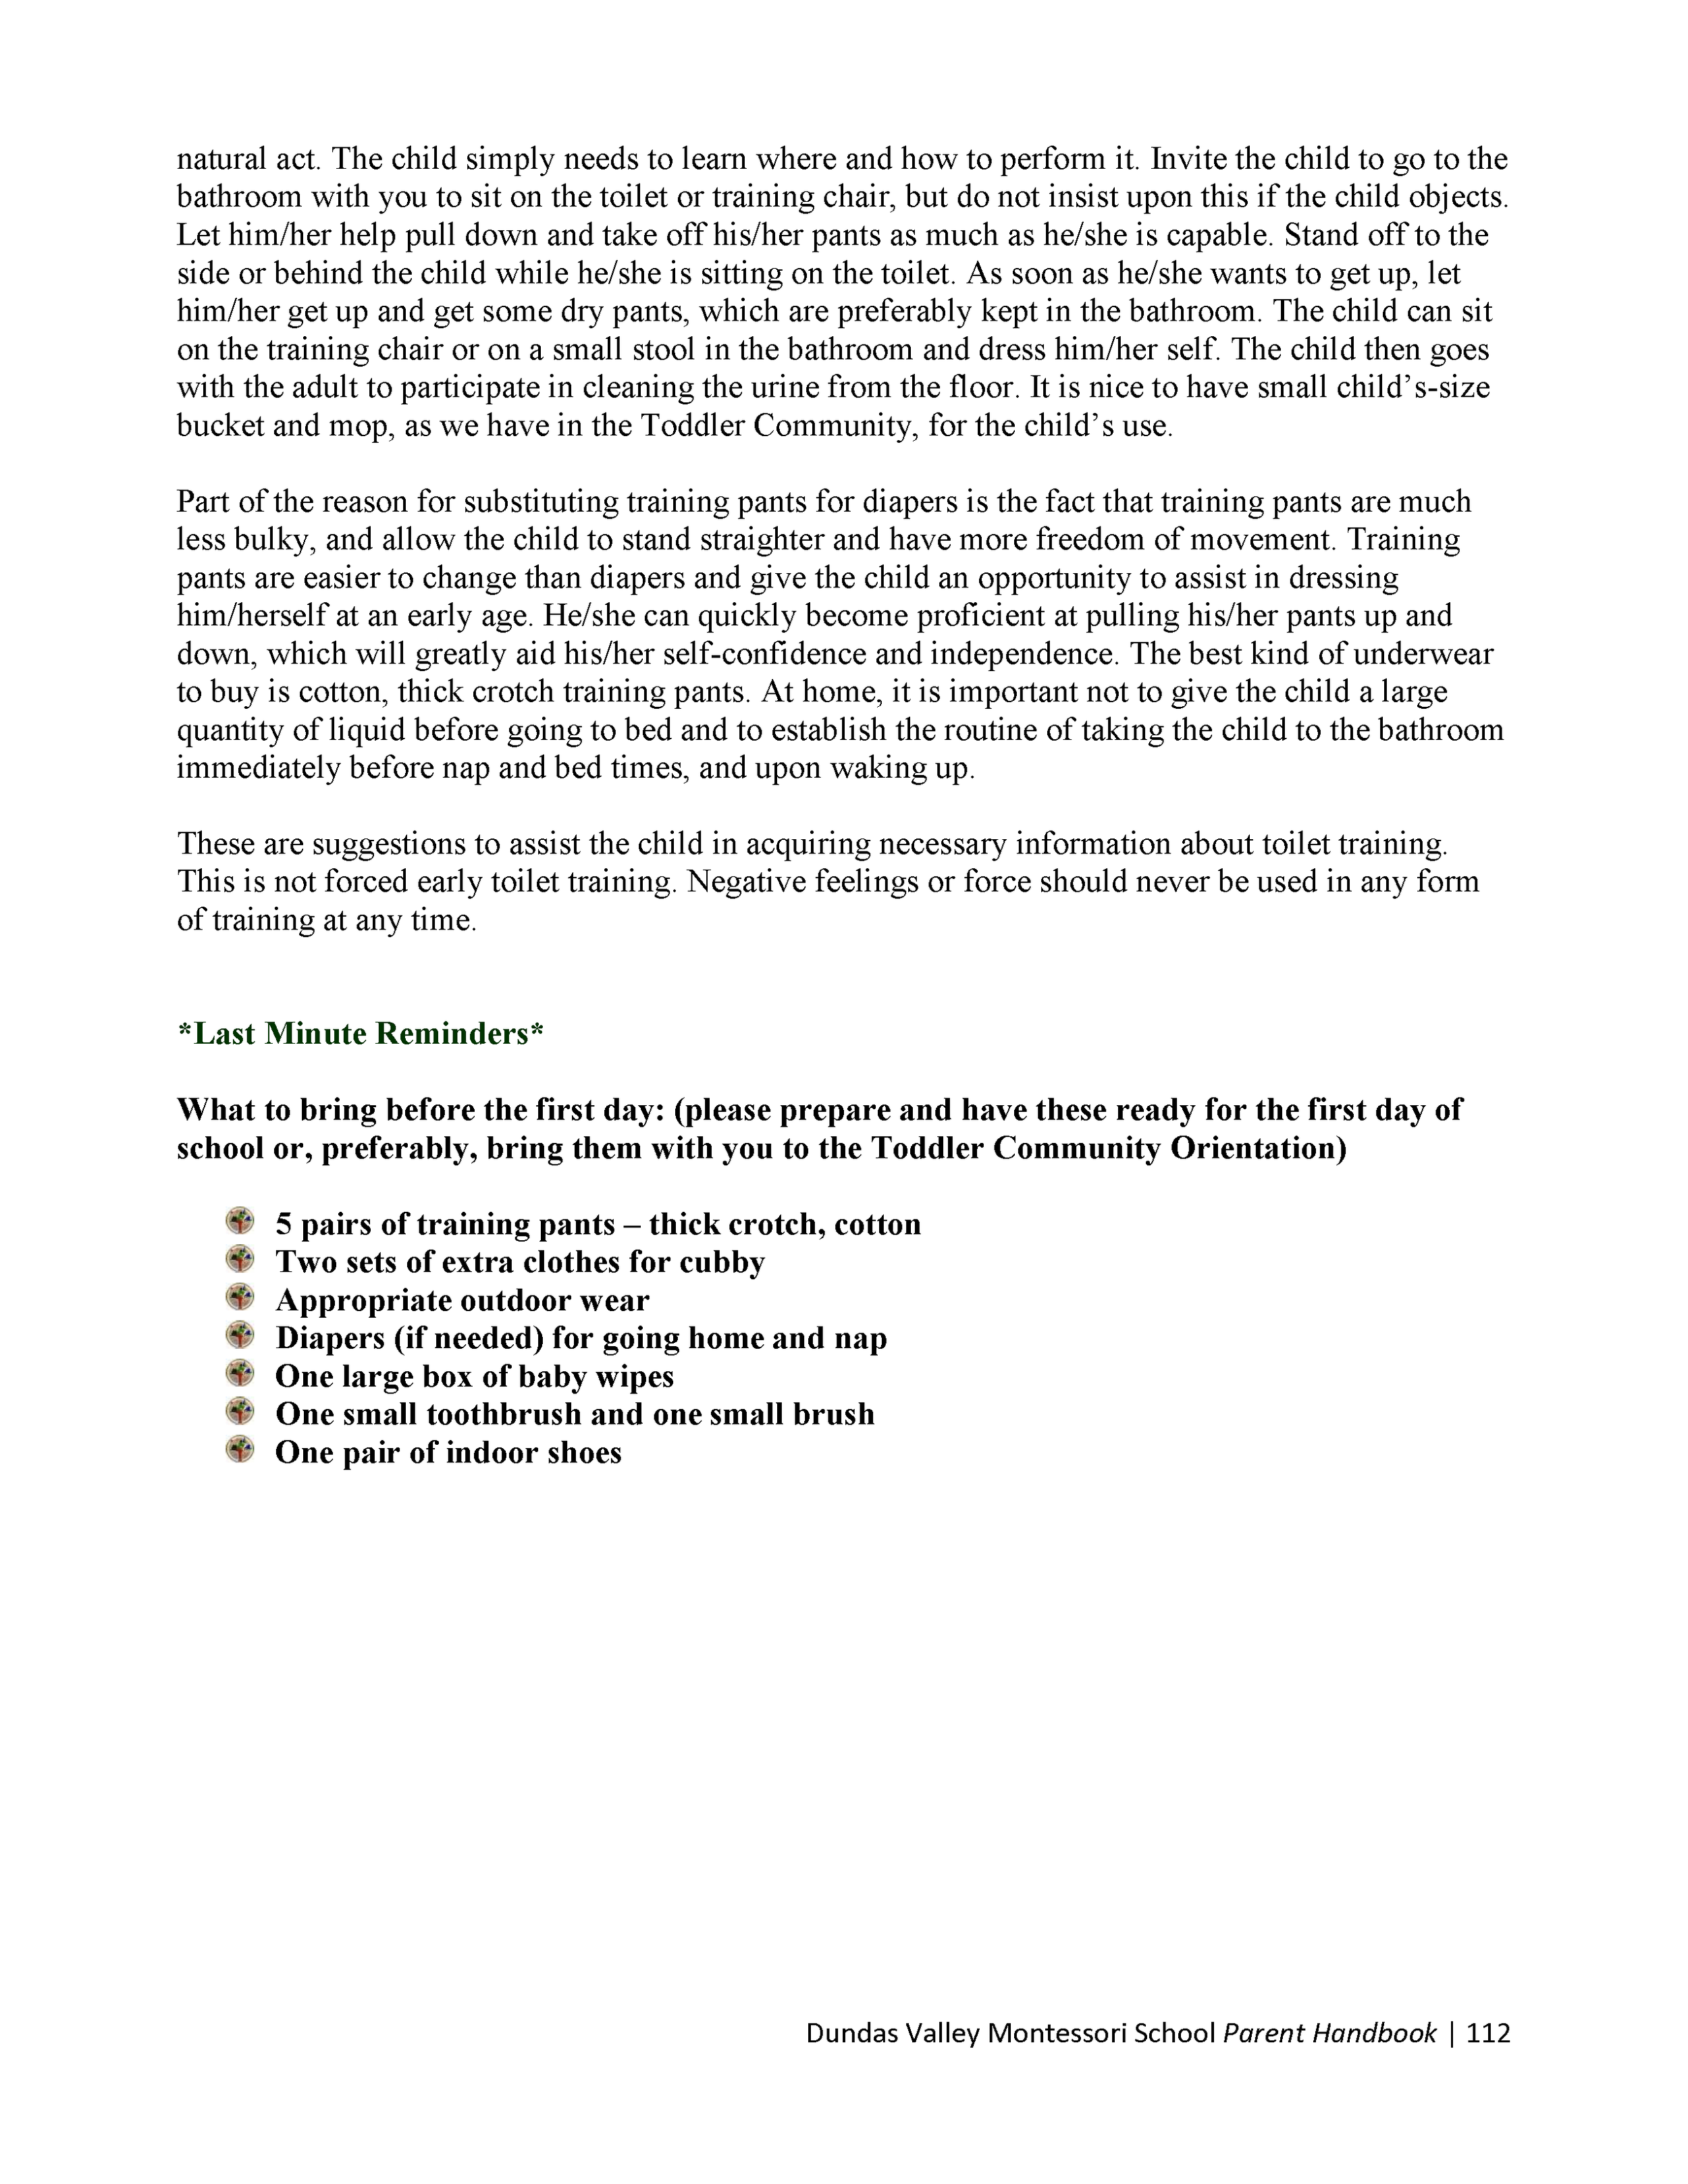 DVMS-Parent-Handbook-19-20_Page_114.png